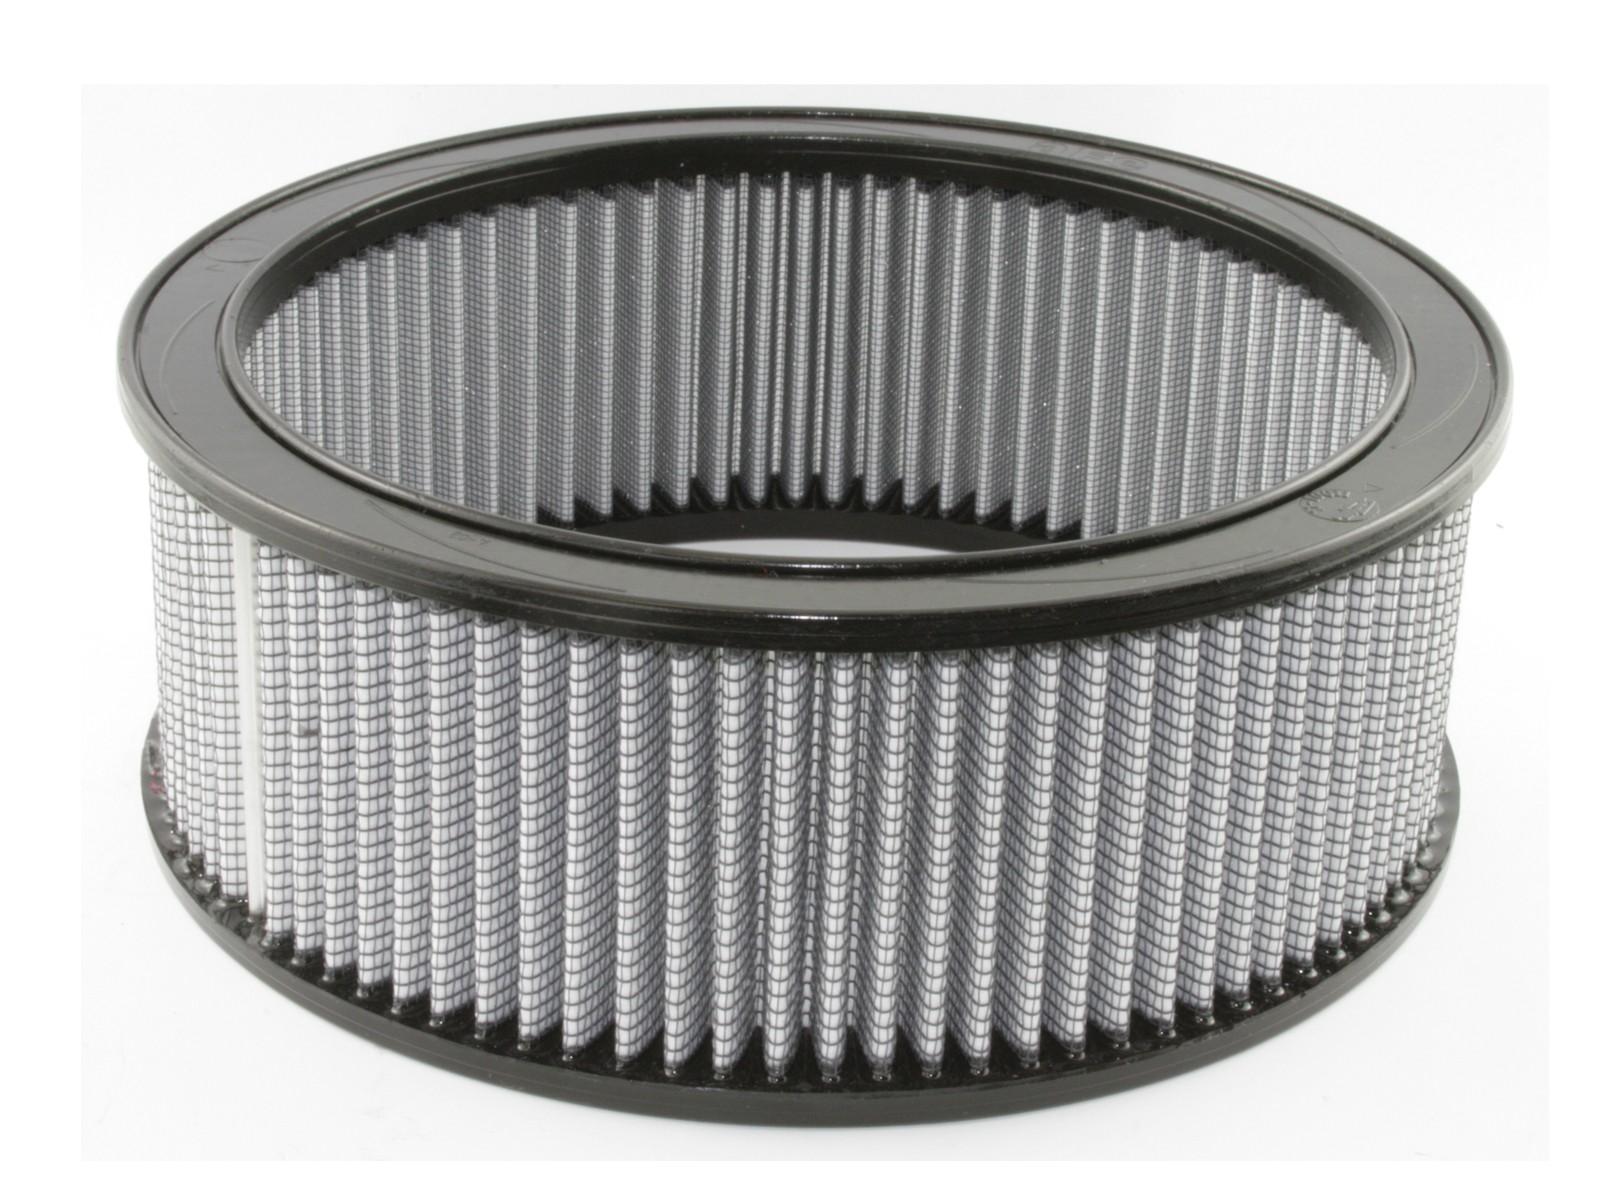 aFe POWER 11-10011 Magnum FLOW Pro DRY S Air Filter